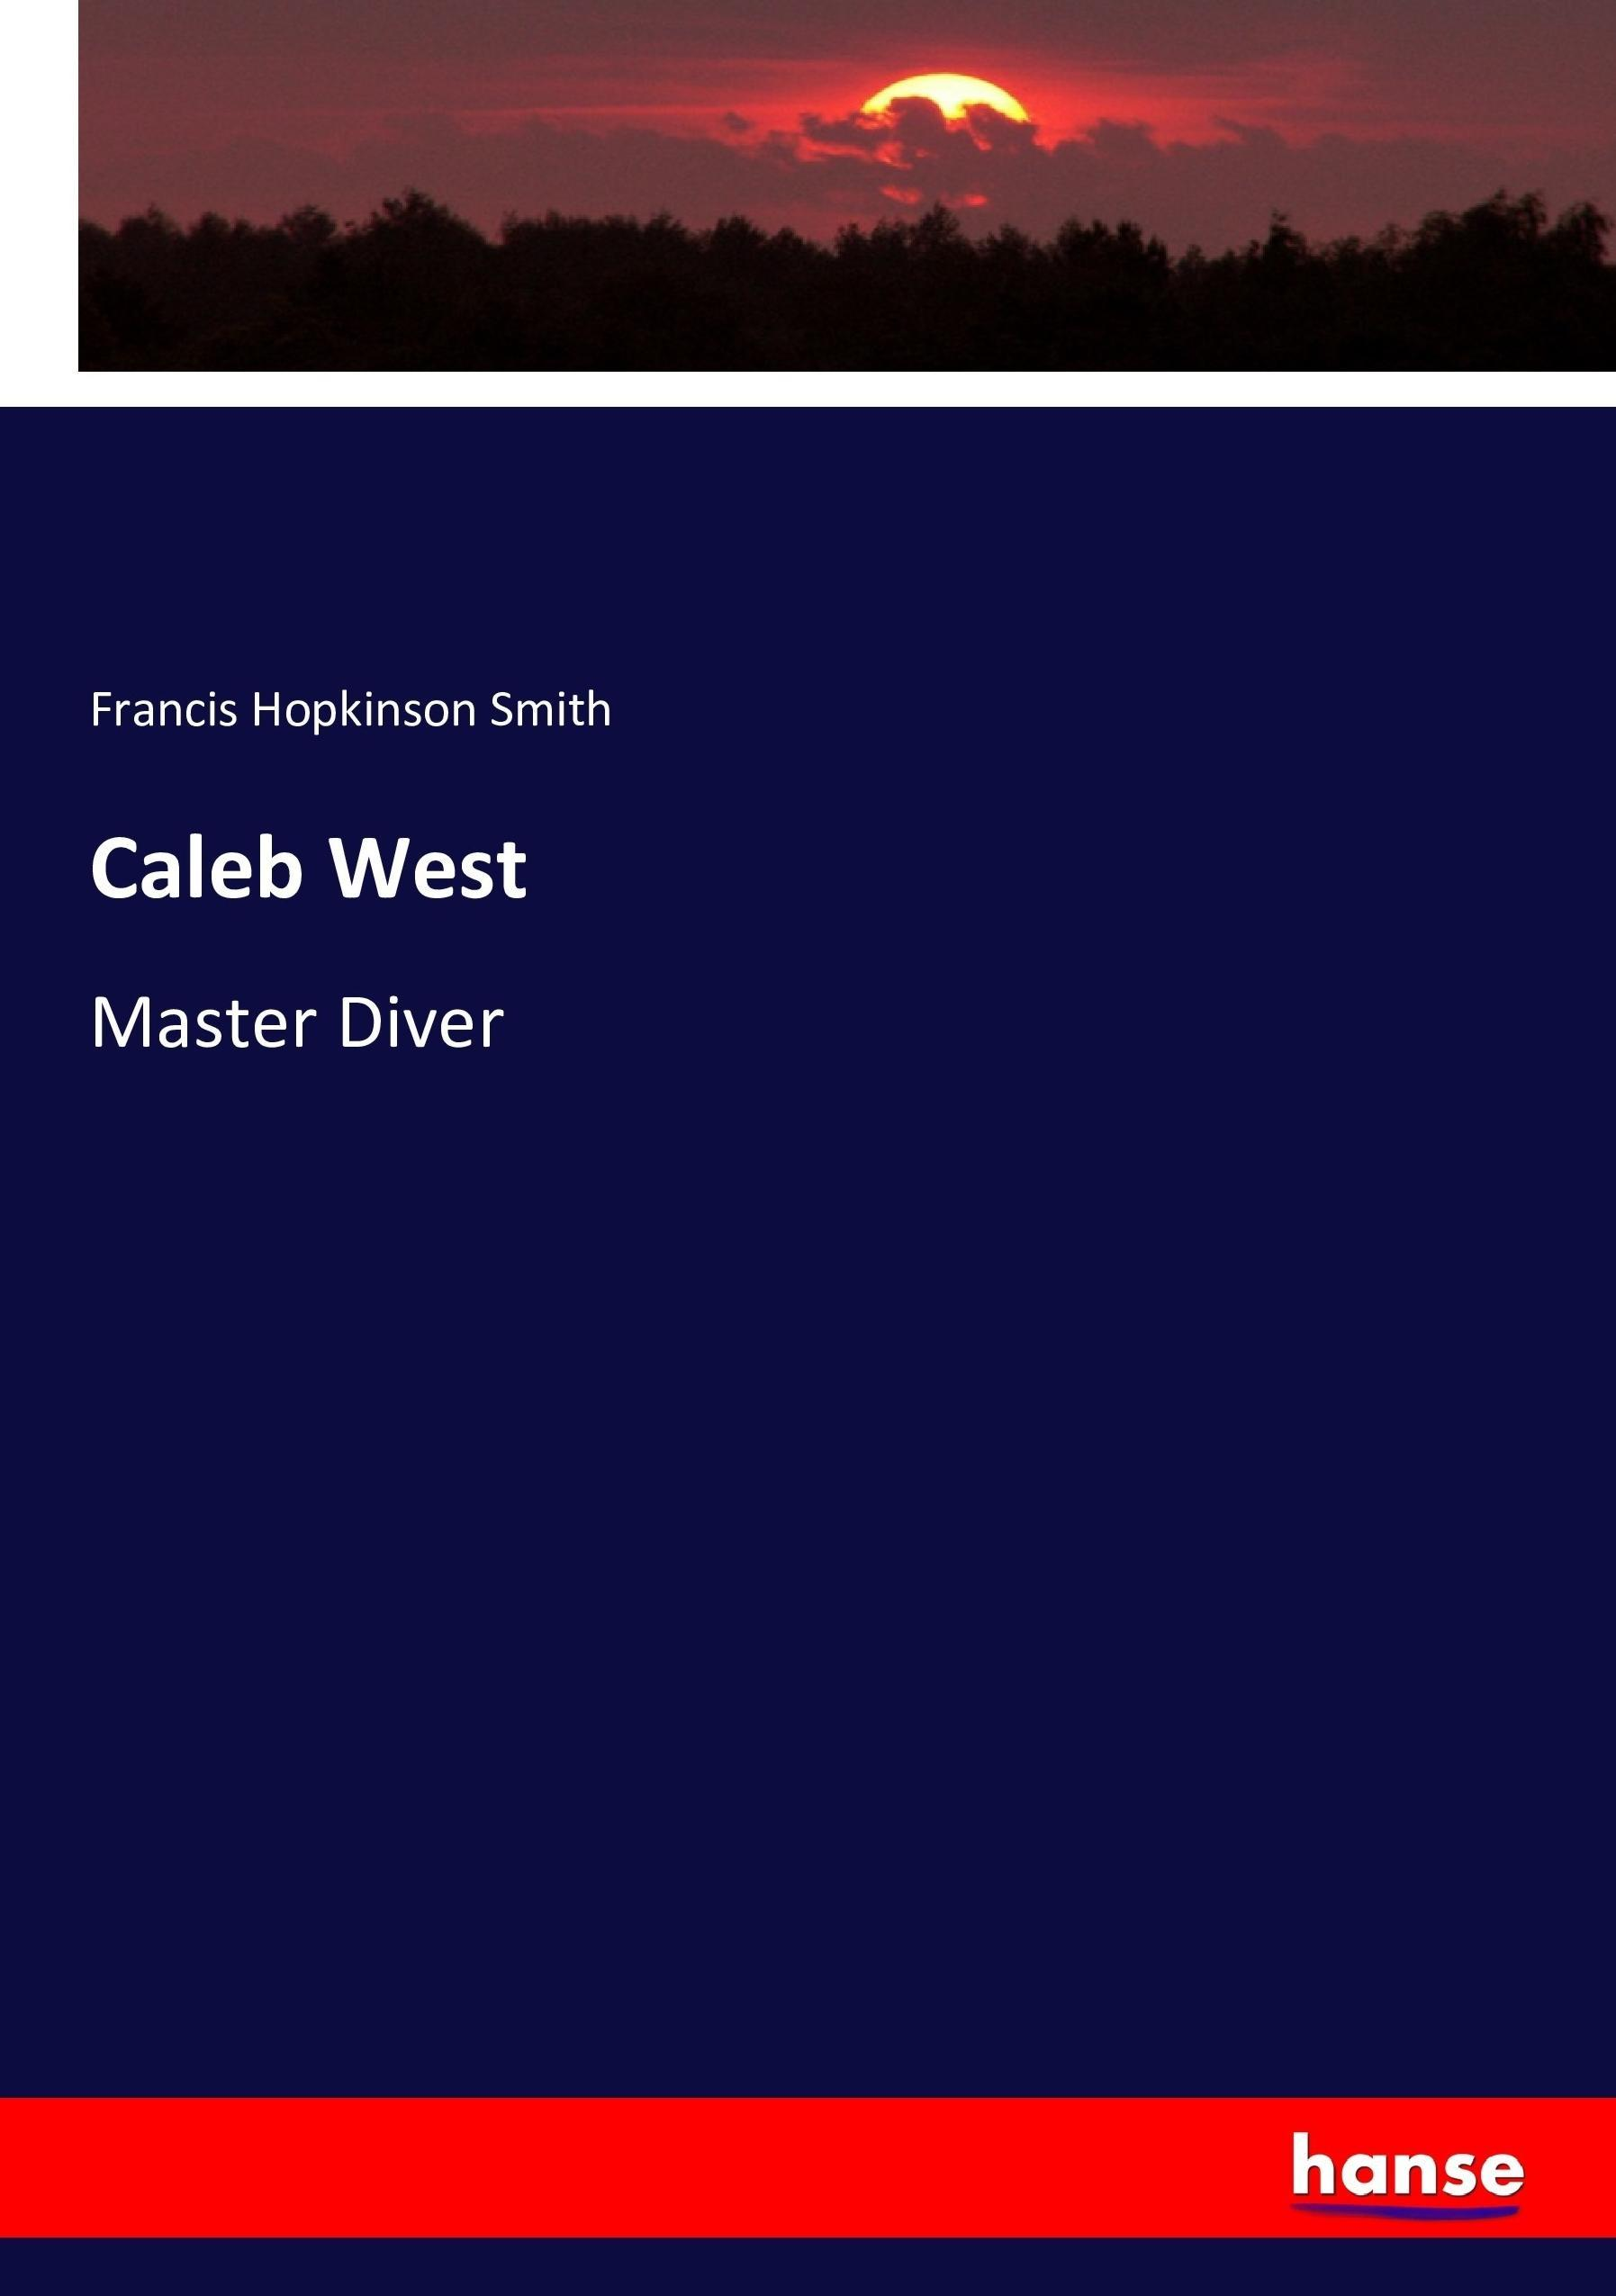 Caleb West Francis Hopkinson Smith